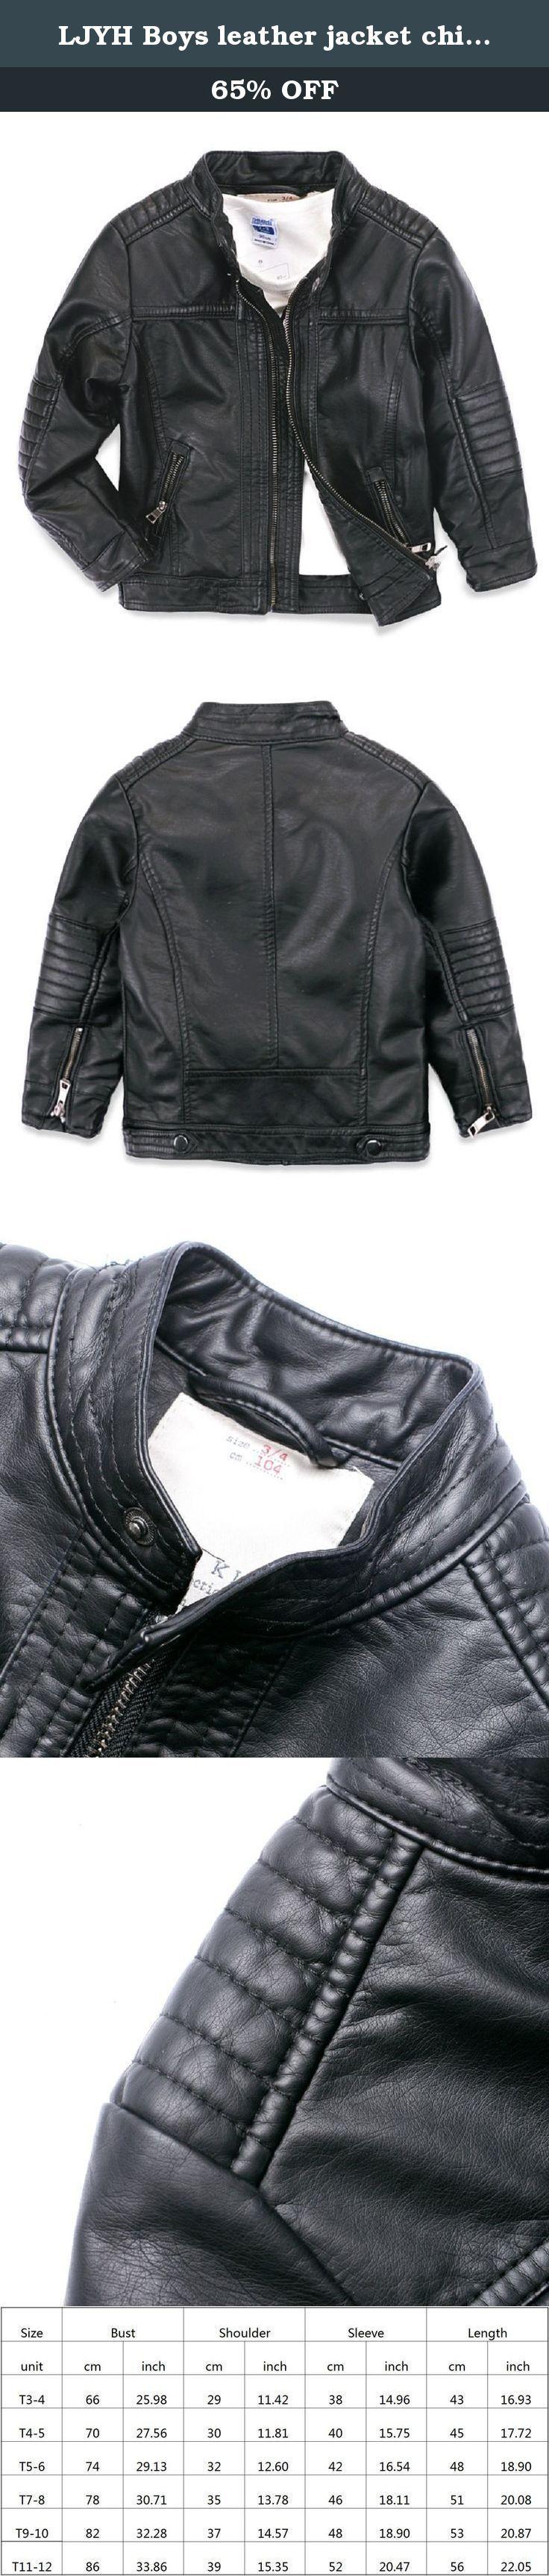 LJYH Boys leather jacket children's motorcycle leather zipper coat black 3-14T Black T5-6. child leather coat.